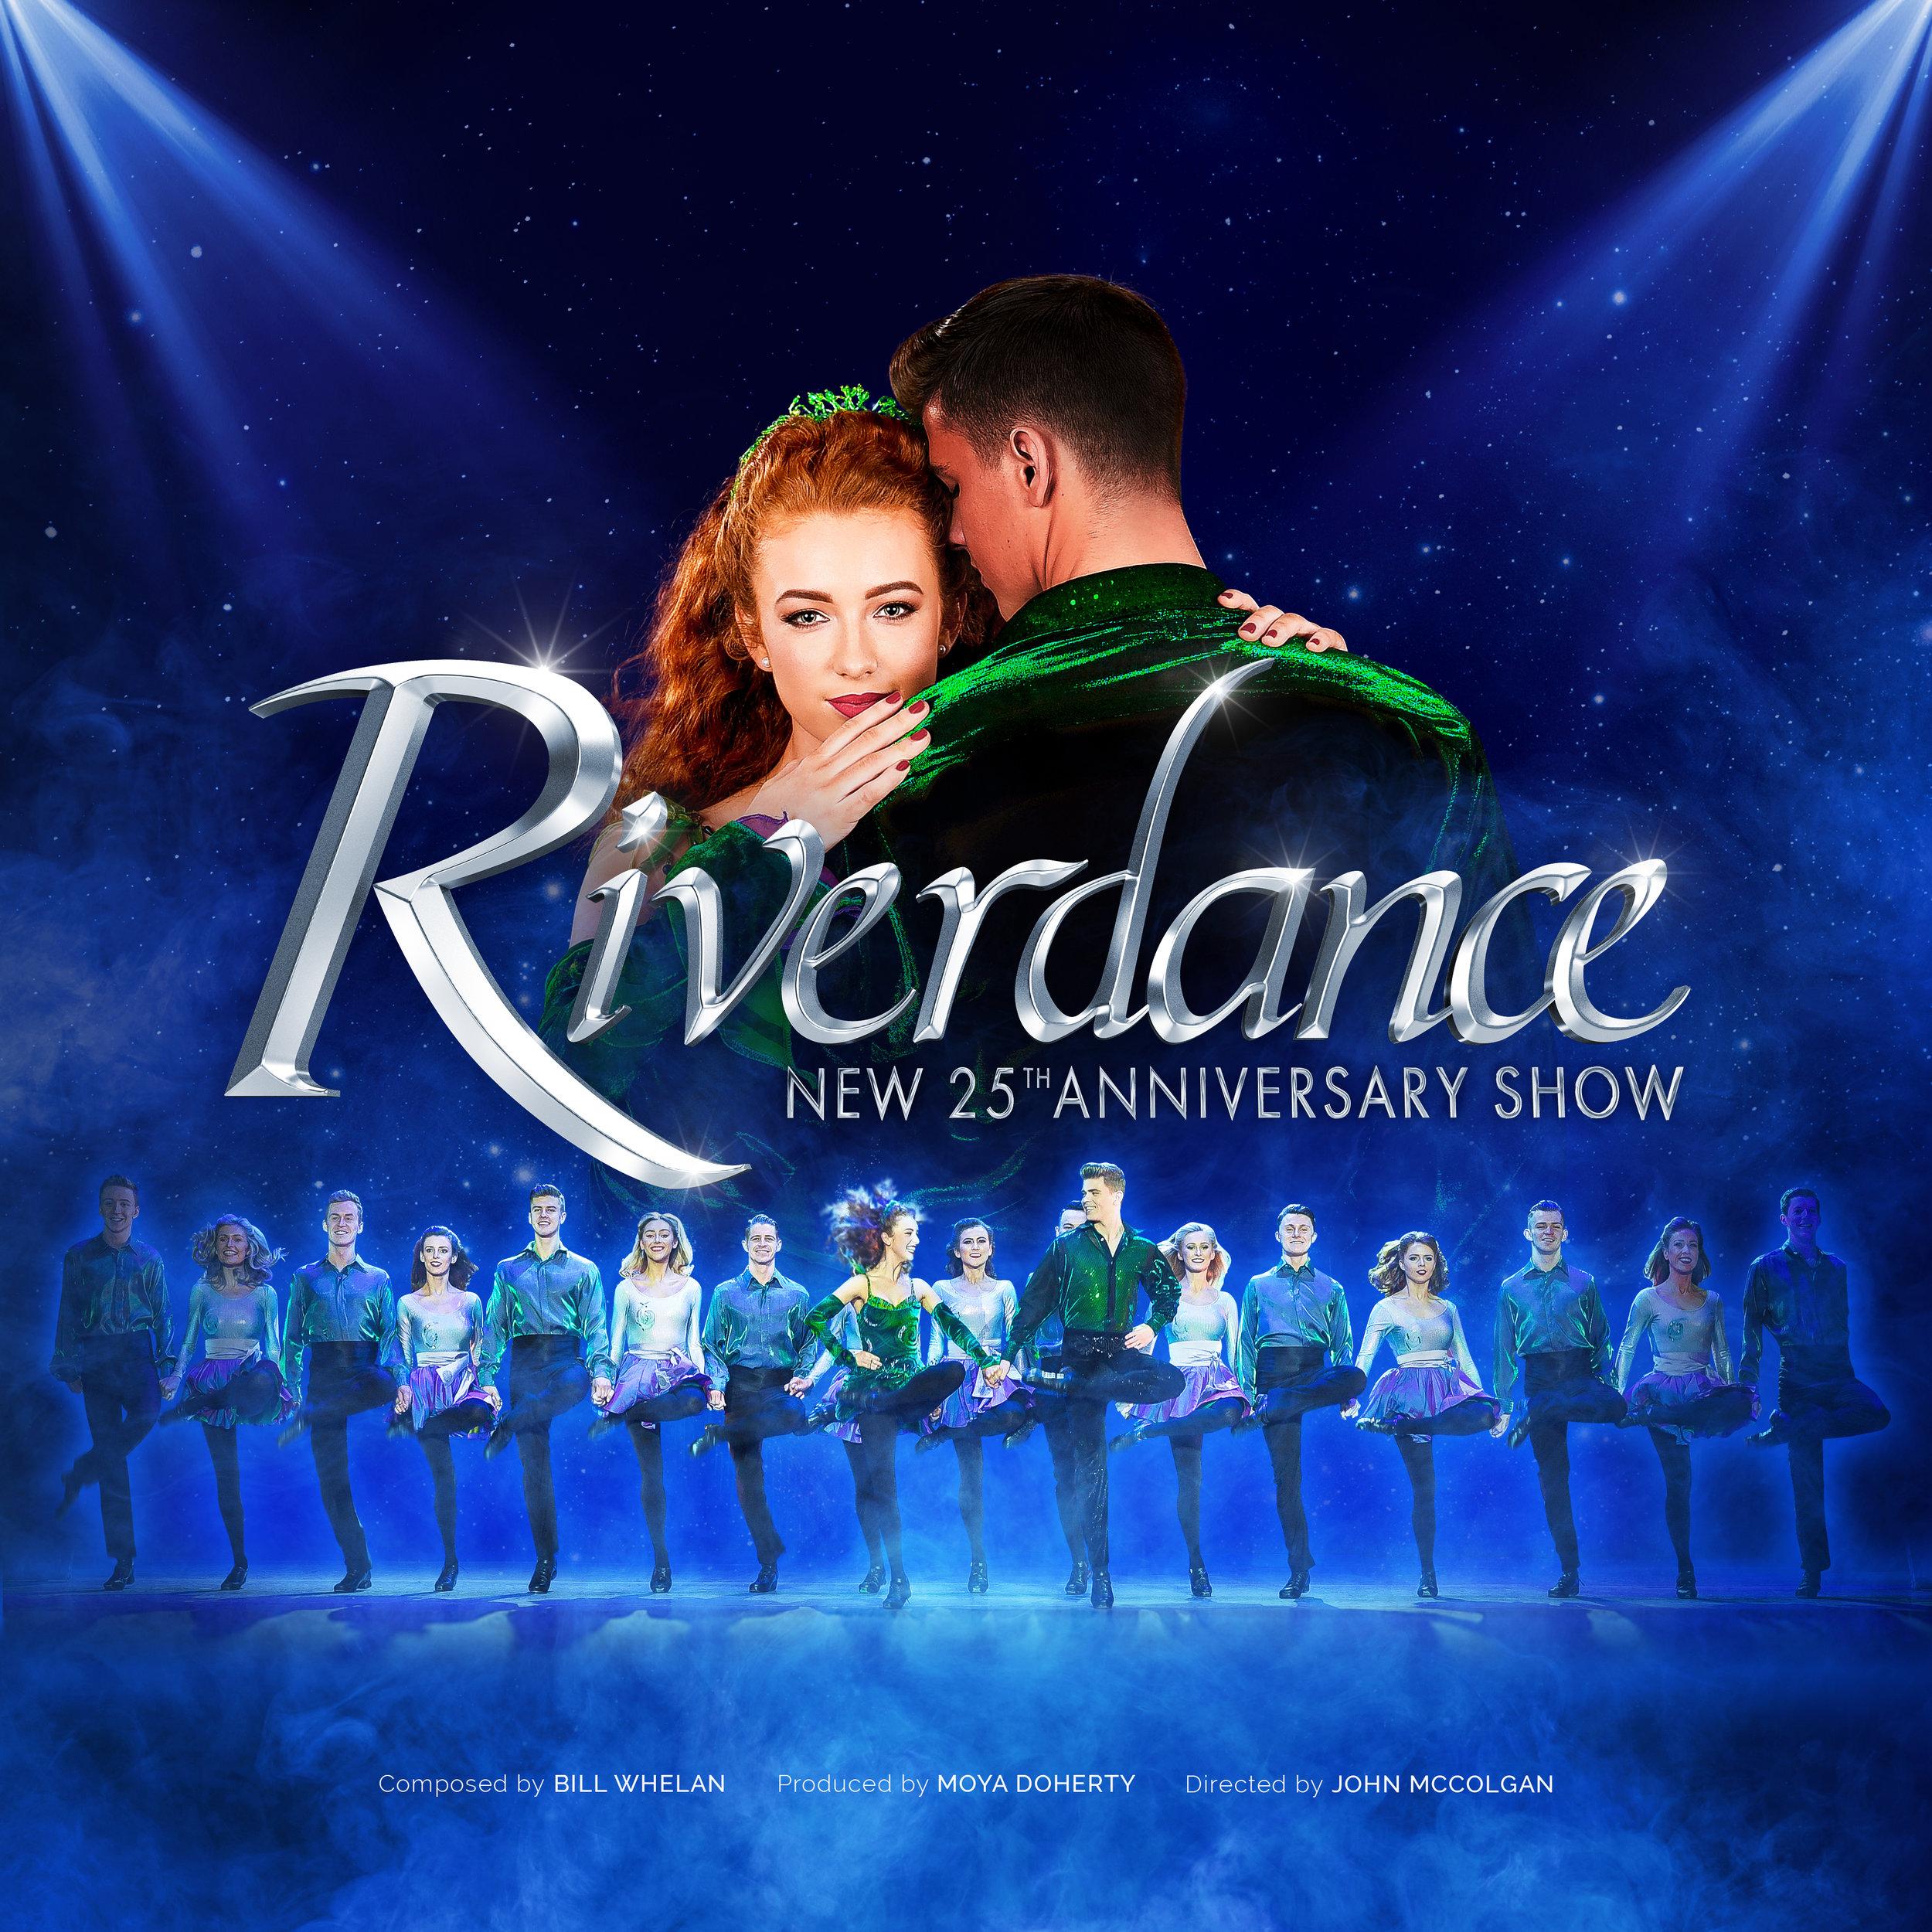 Riverdance_25th_Anniversary_with_logo.jpg